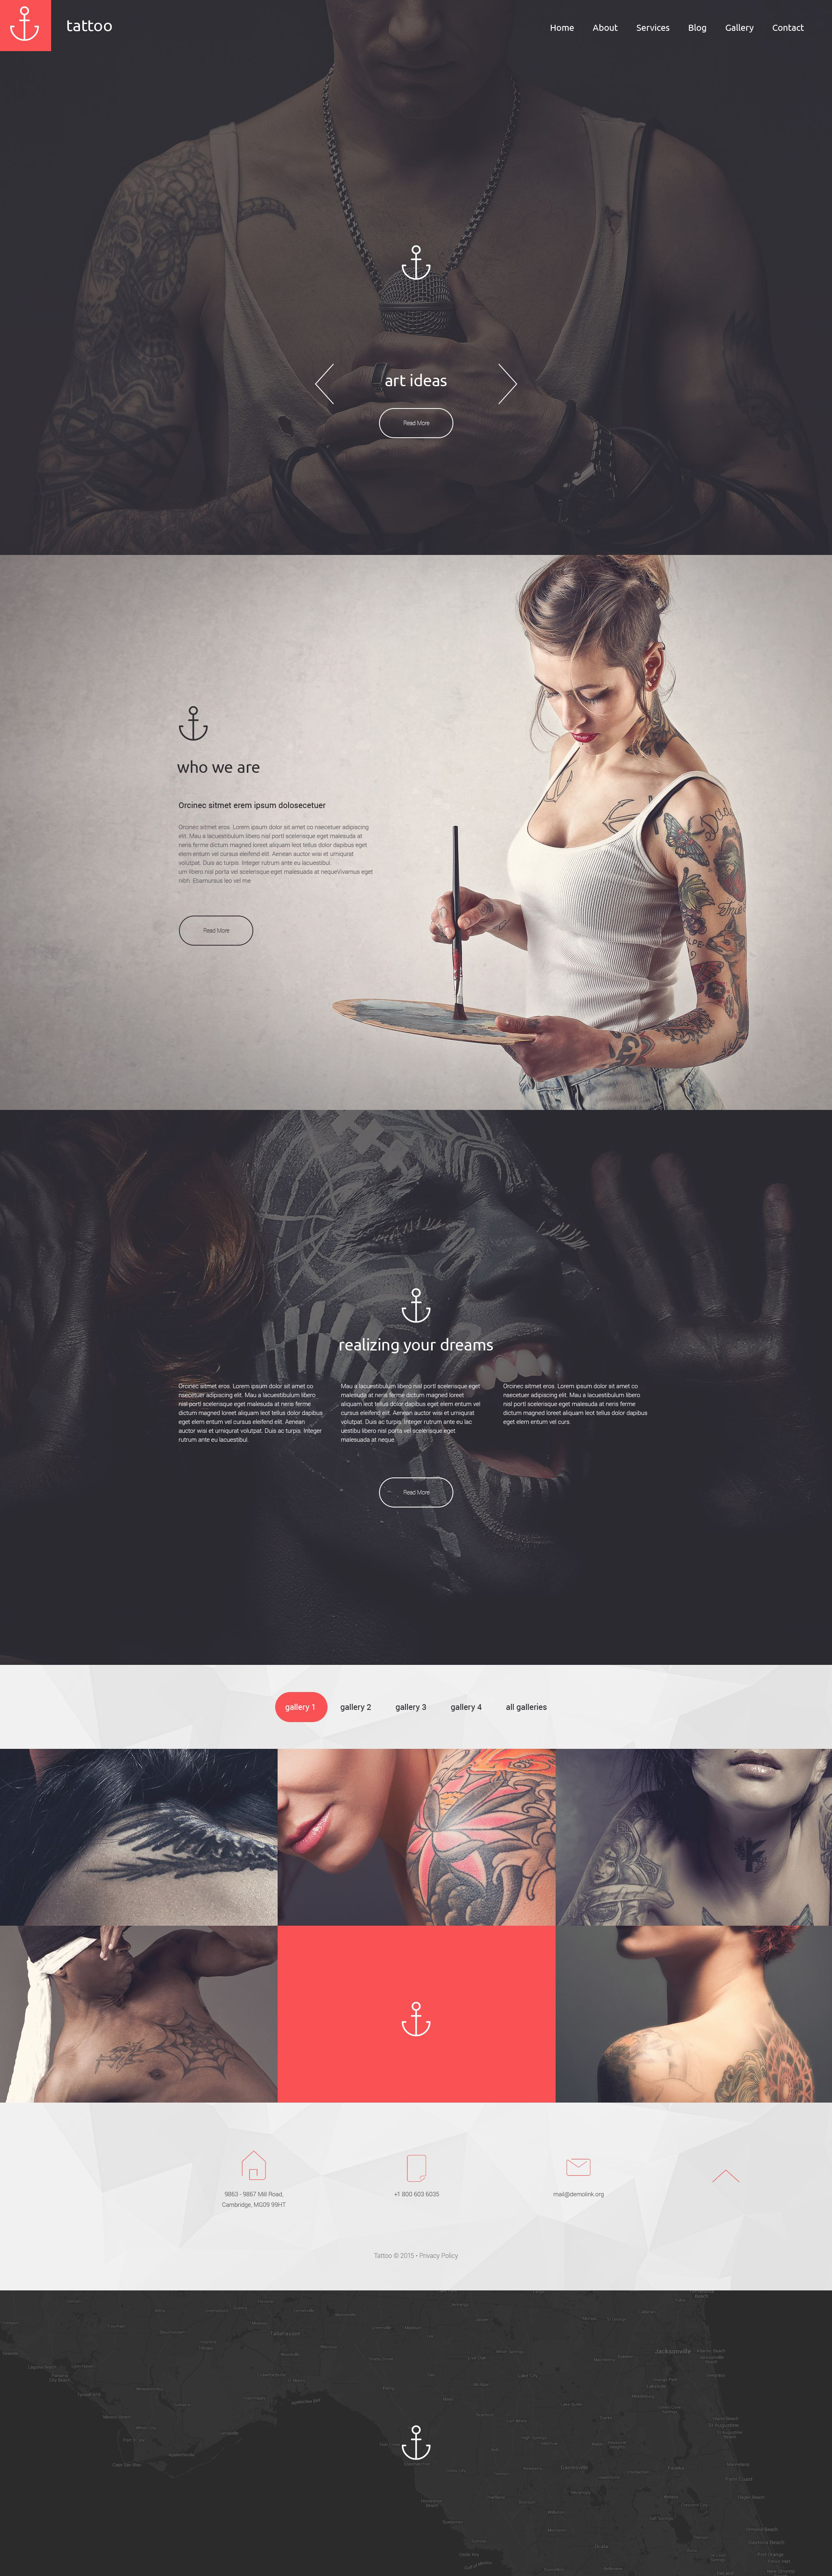 """Tattoo"" Responsive Drupal Template №55364"